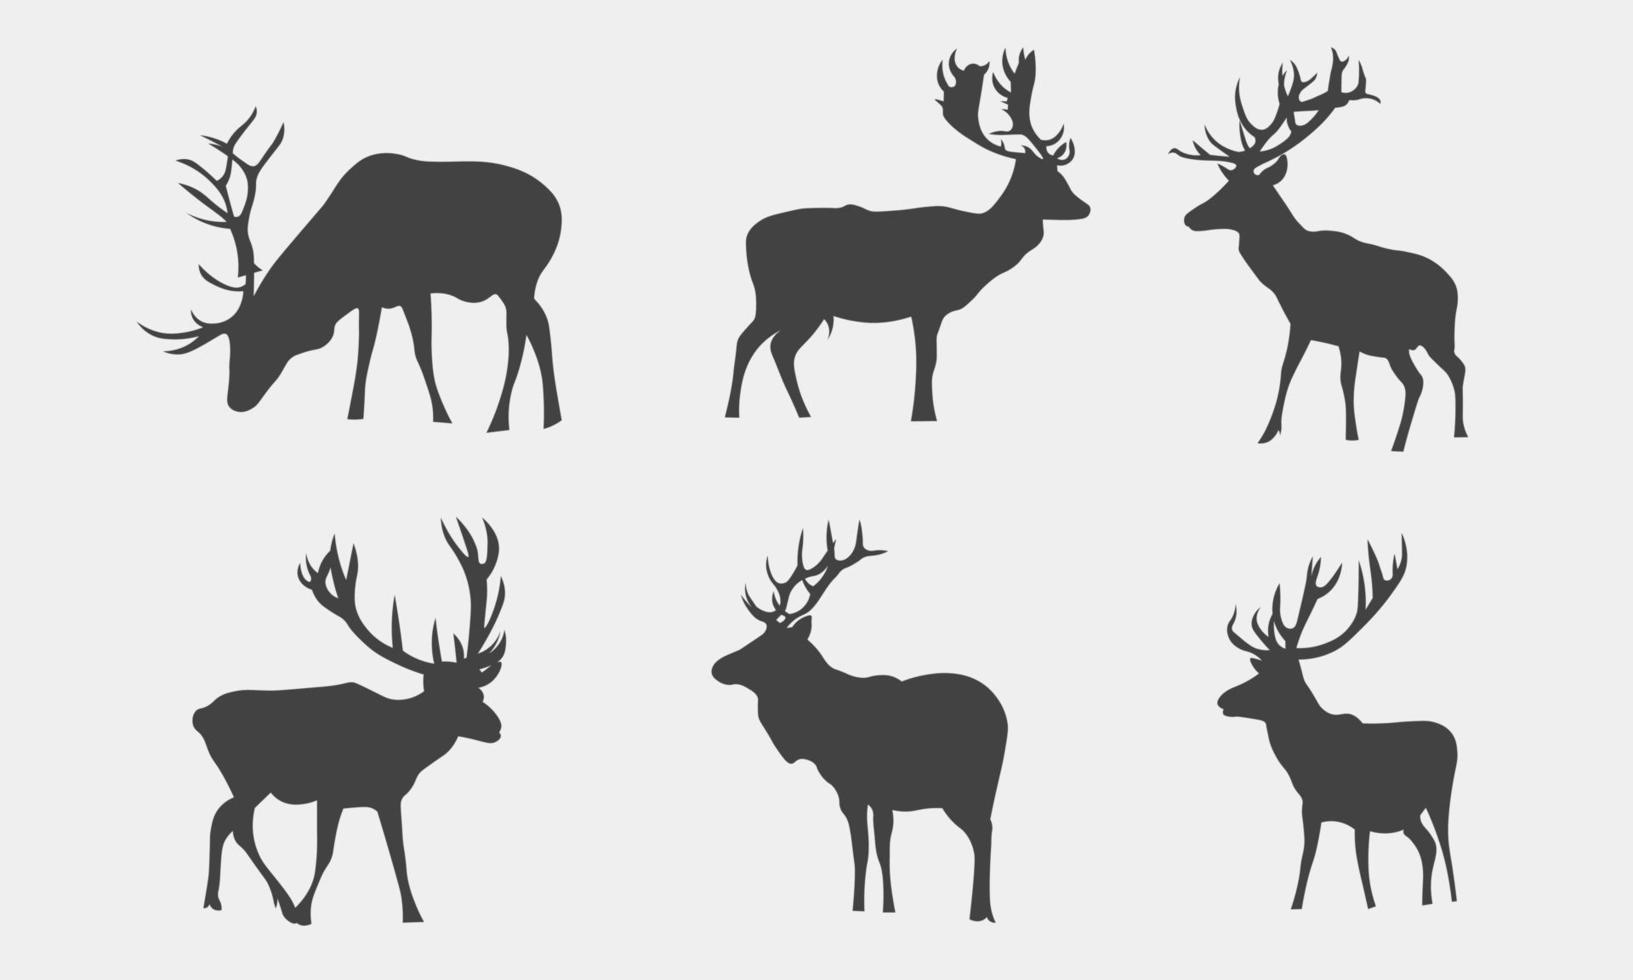 vektor illustration av djur rådjur silhuetter samling